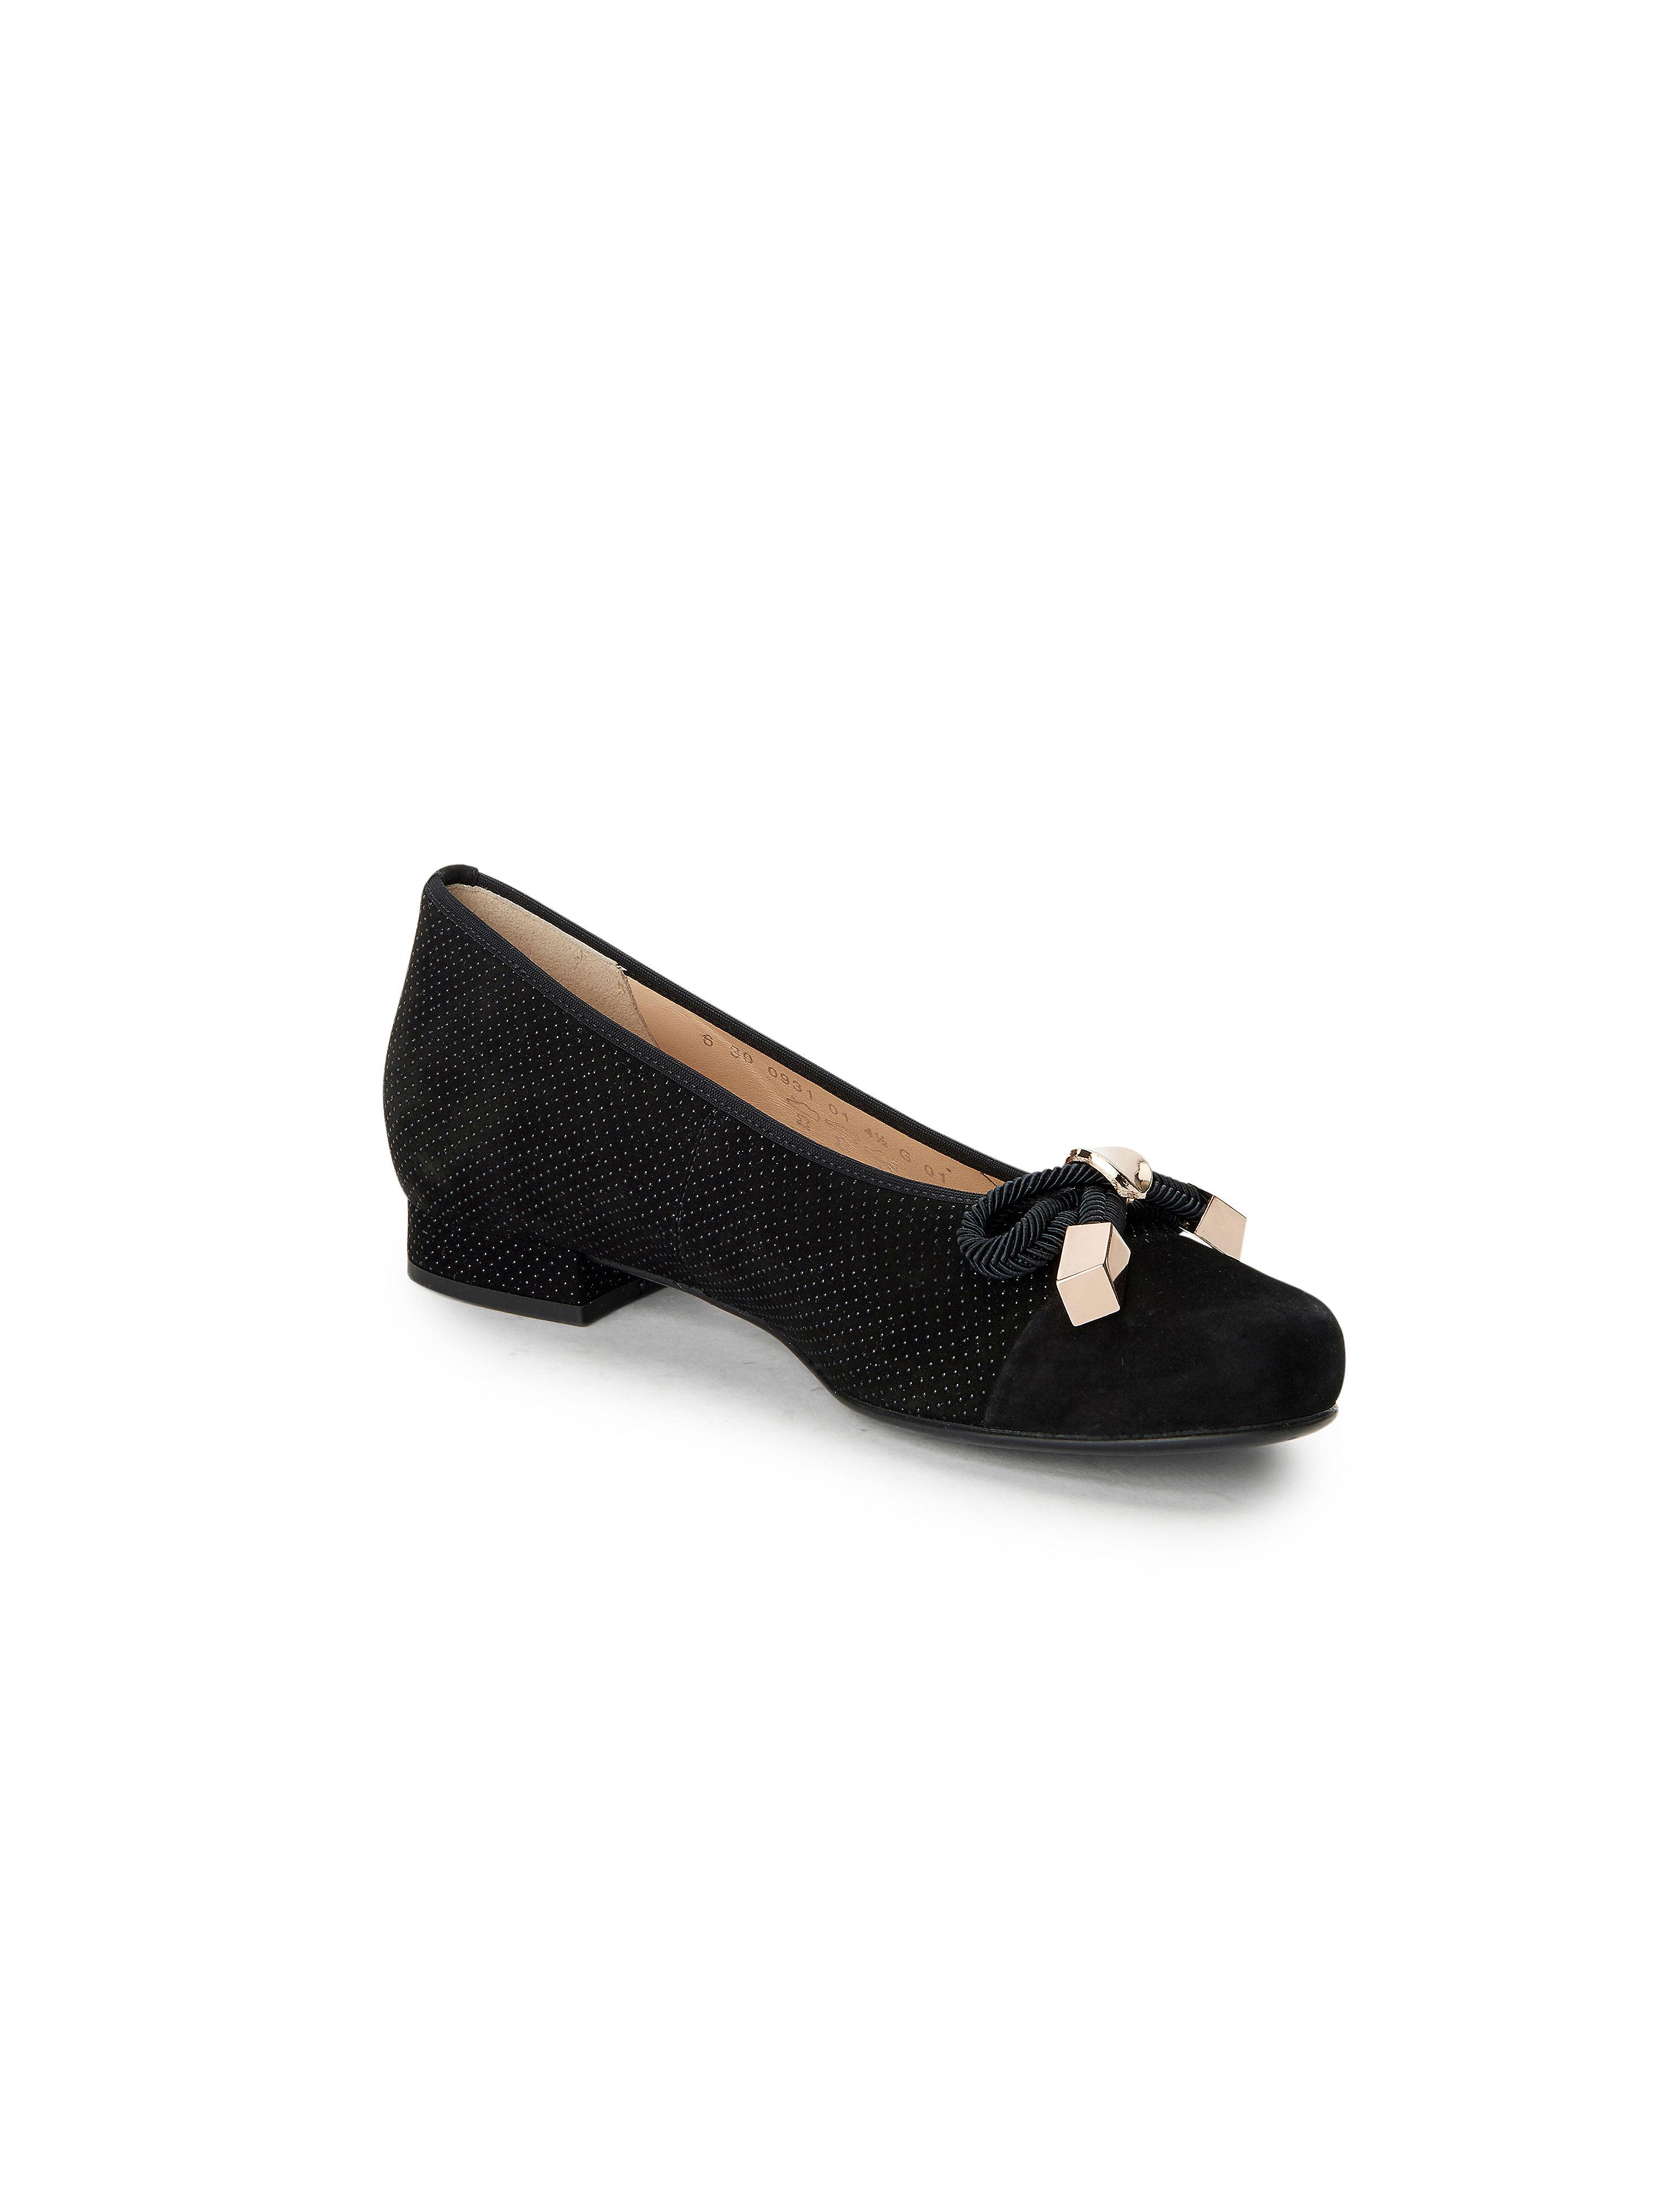 Hassia - Femininer Ballerina Bologna G aus 100% Leder - Schwarz Gute Qualität beliebte Schuhe